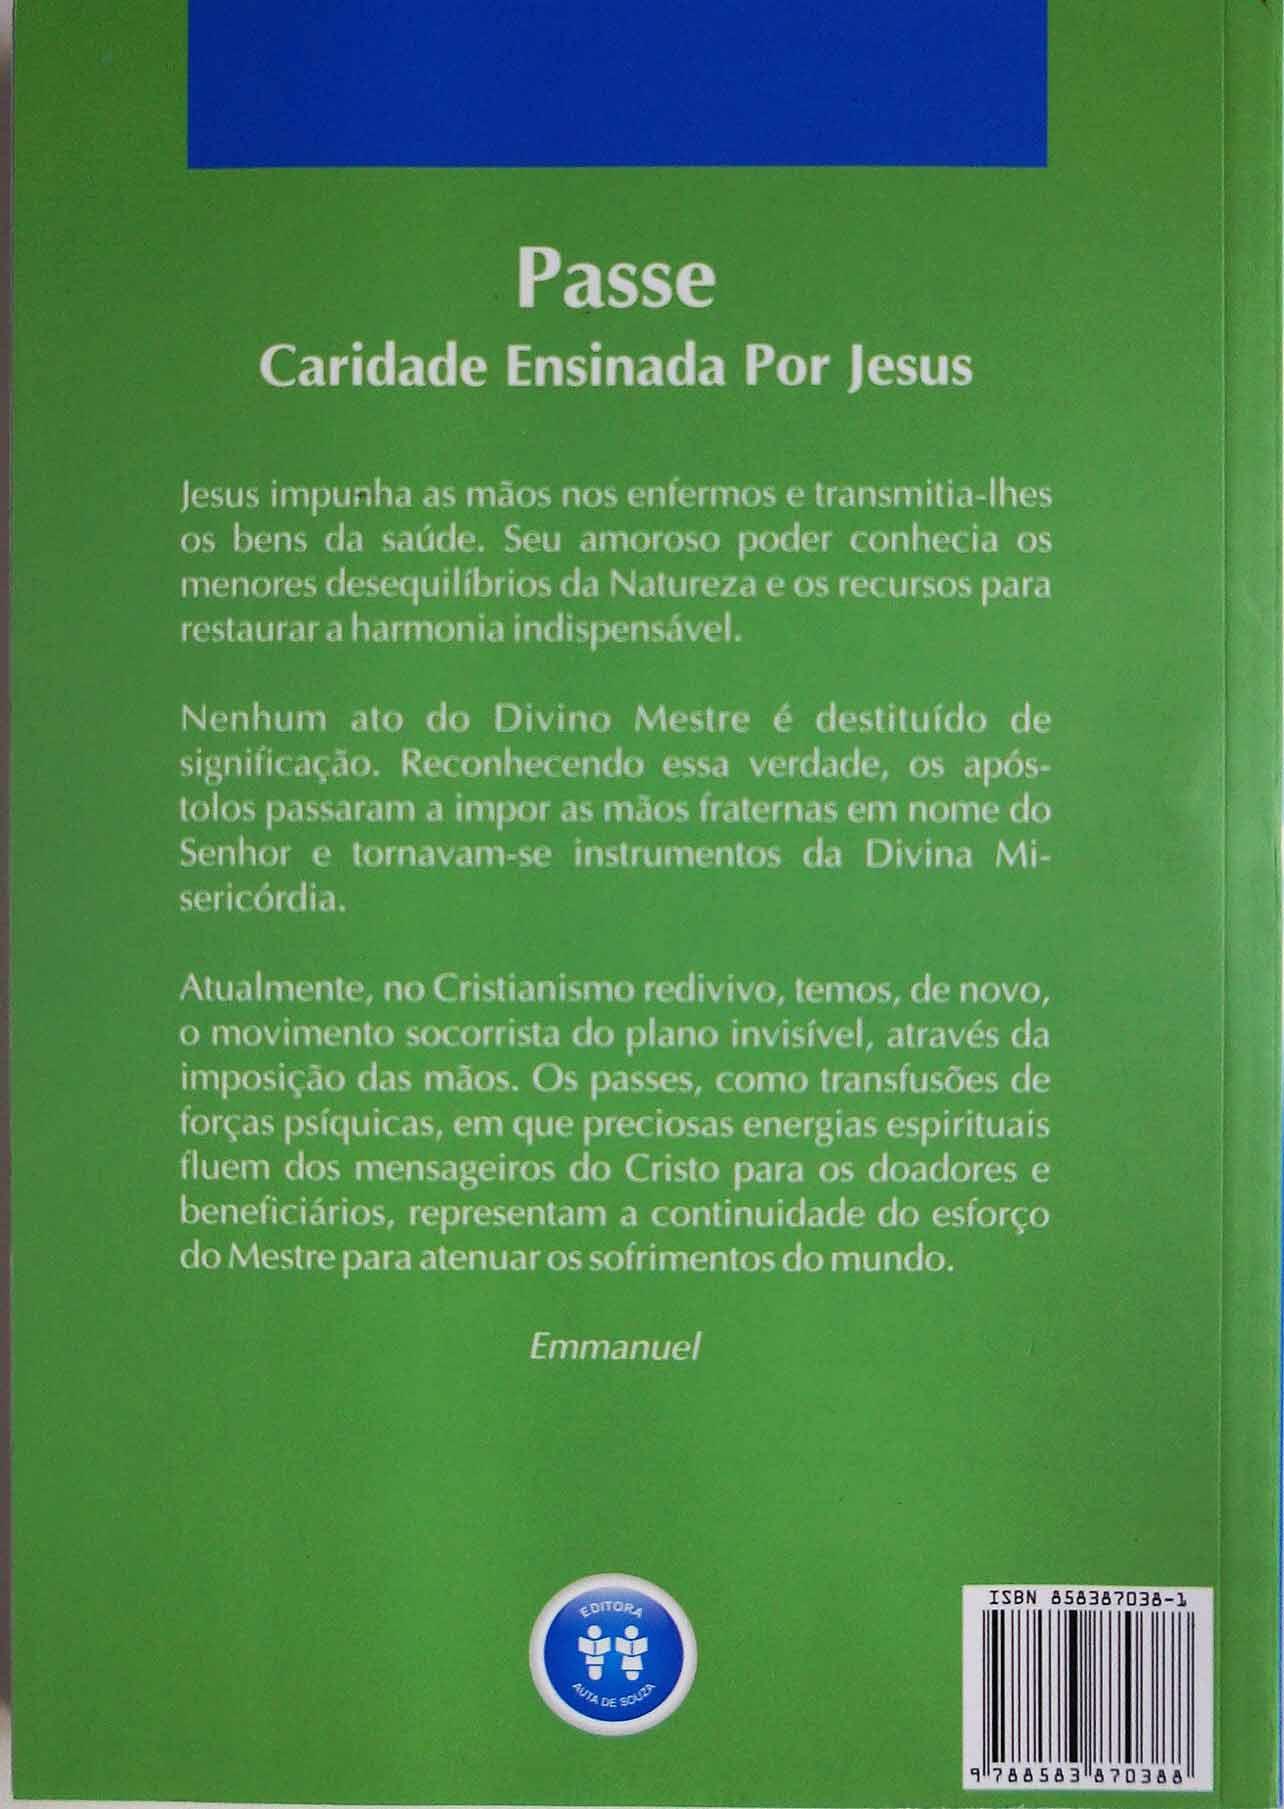 PASSE - CARIDADE ENSINADA POR JESUS